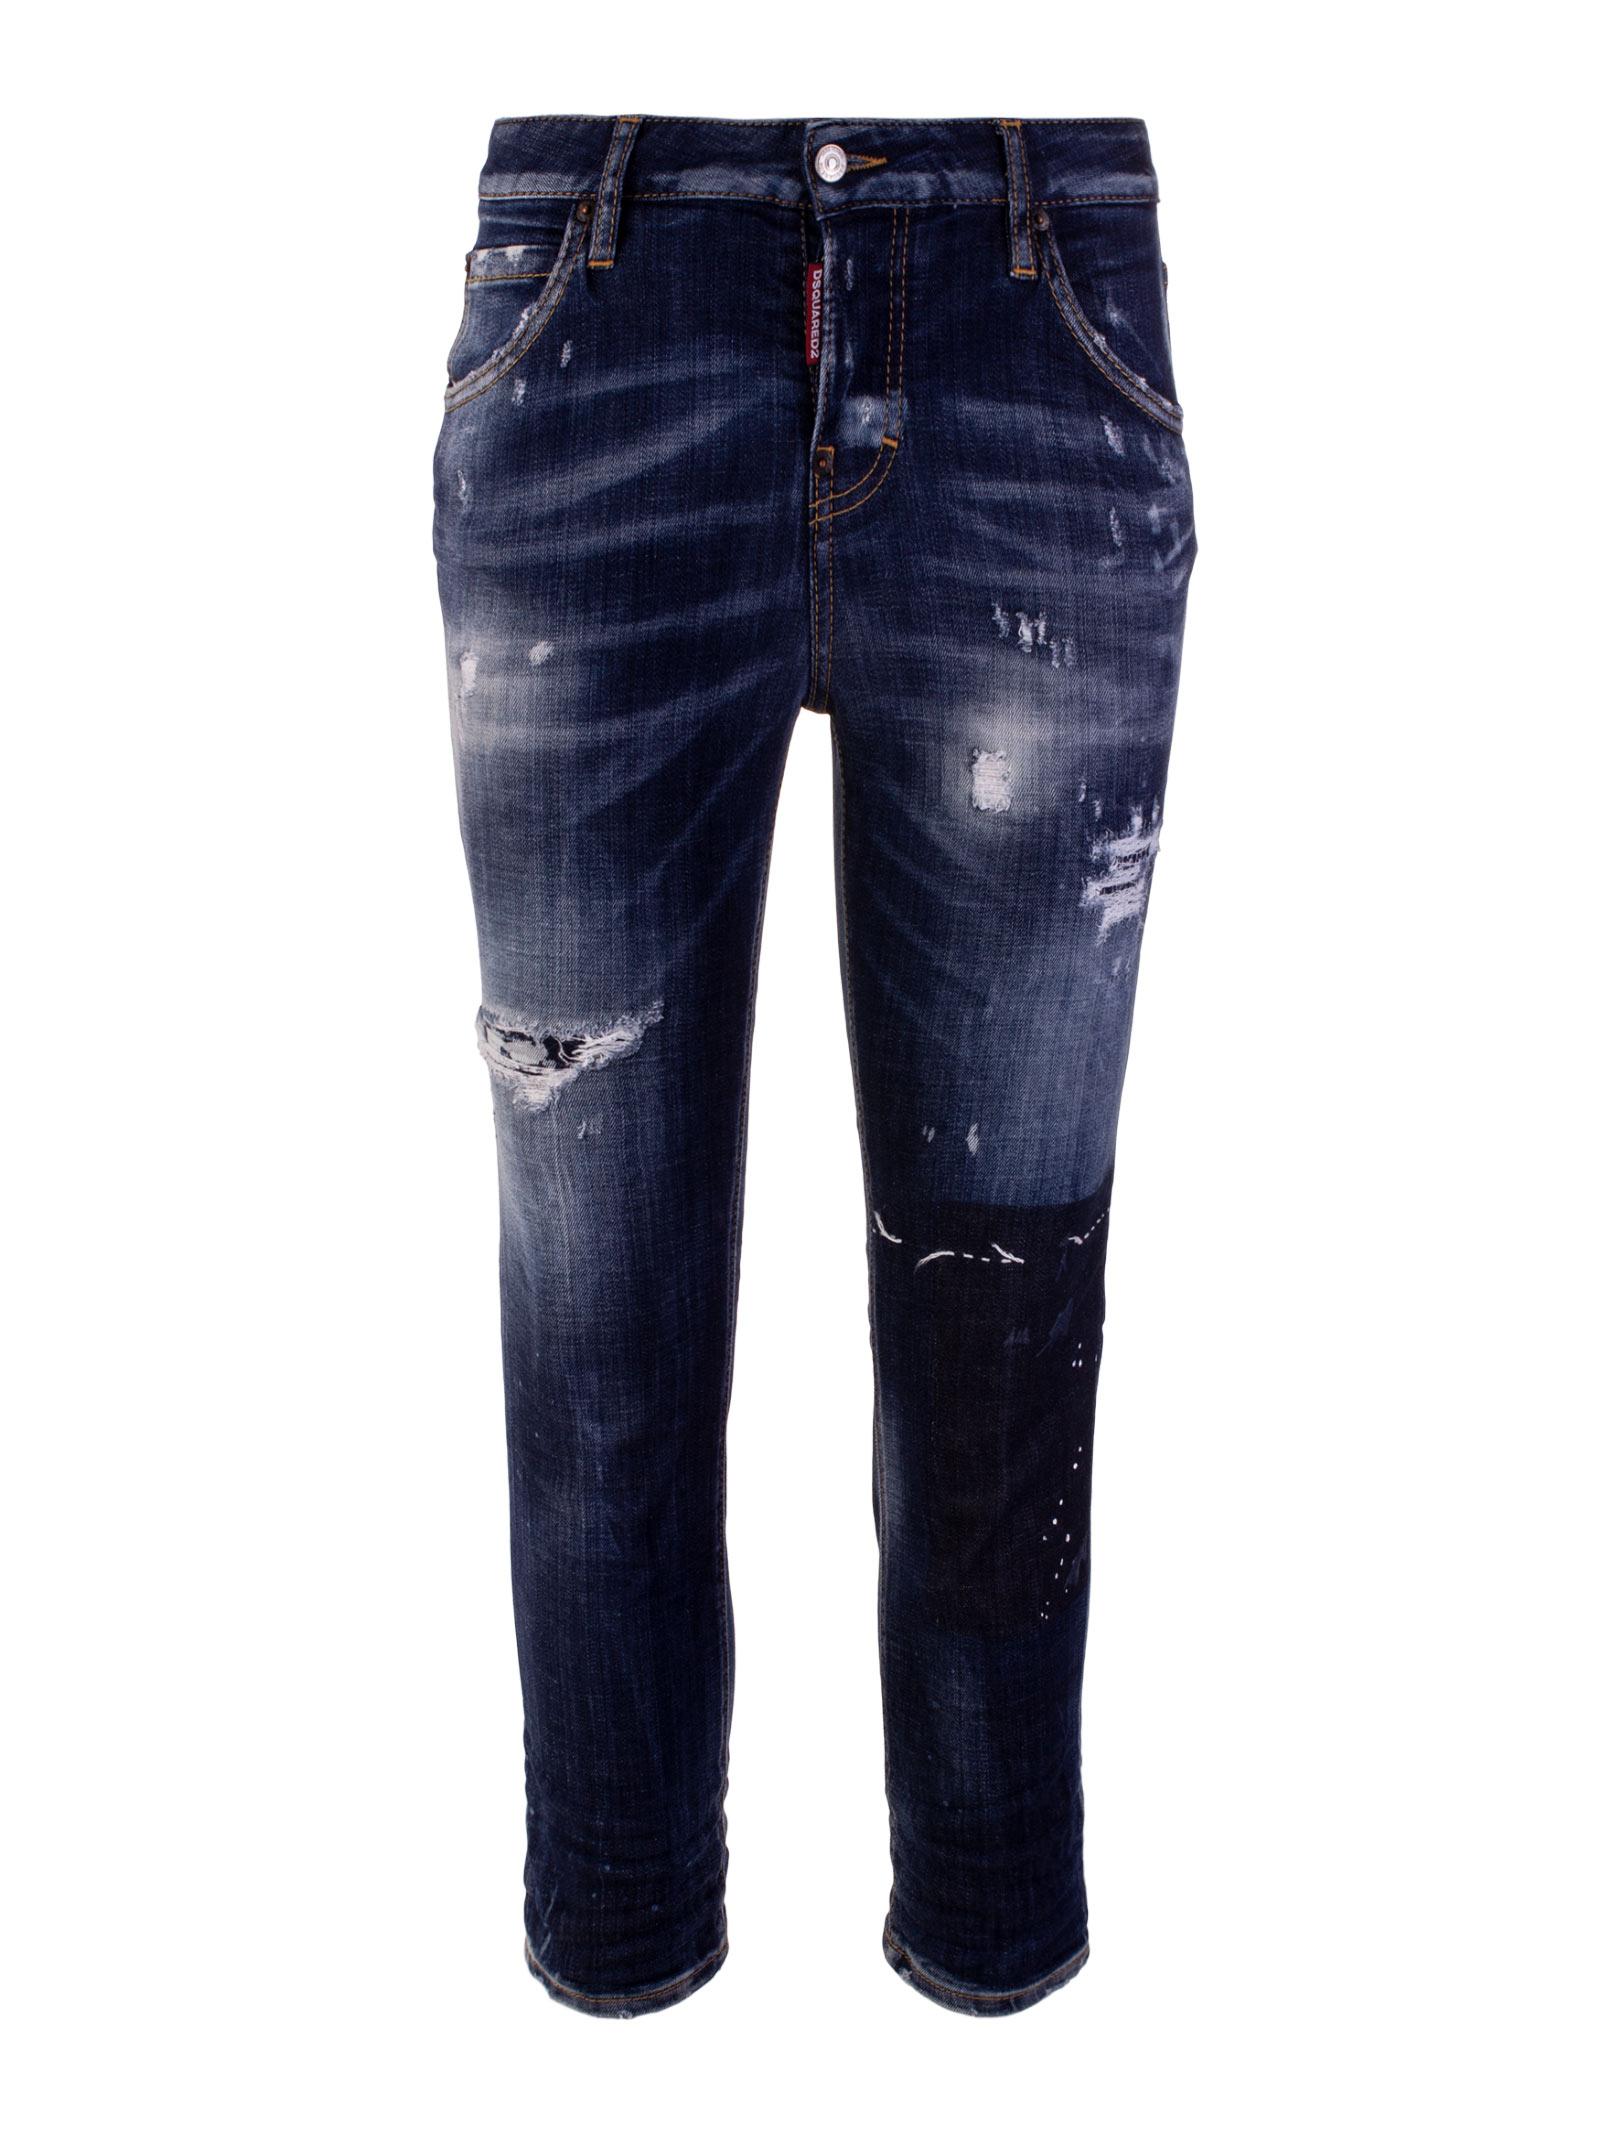 Jeans Dsquared2 - Dsquared2 - Michele Franzese Moda 7be8c85c68ba